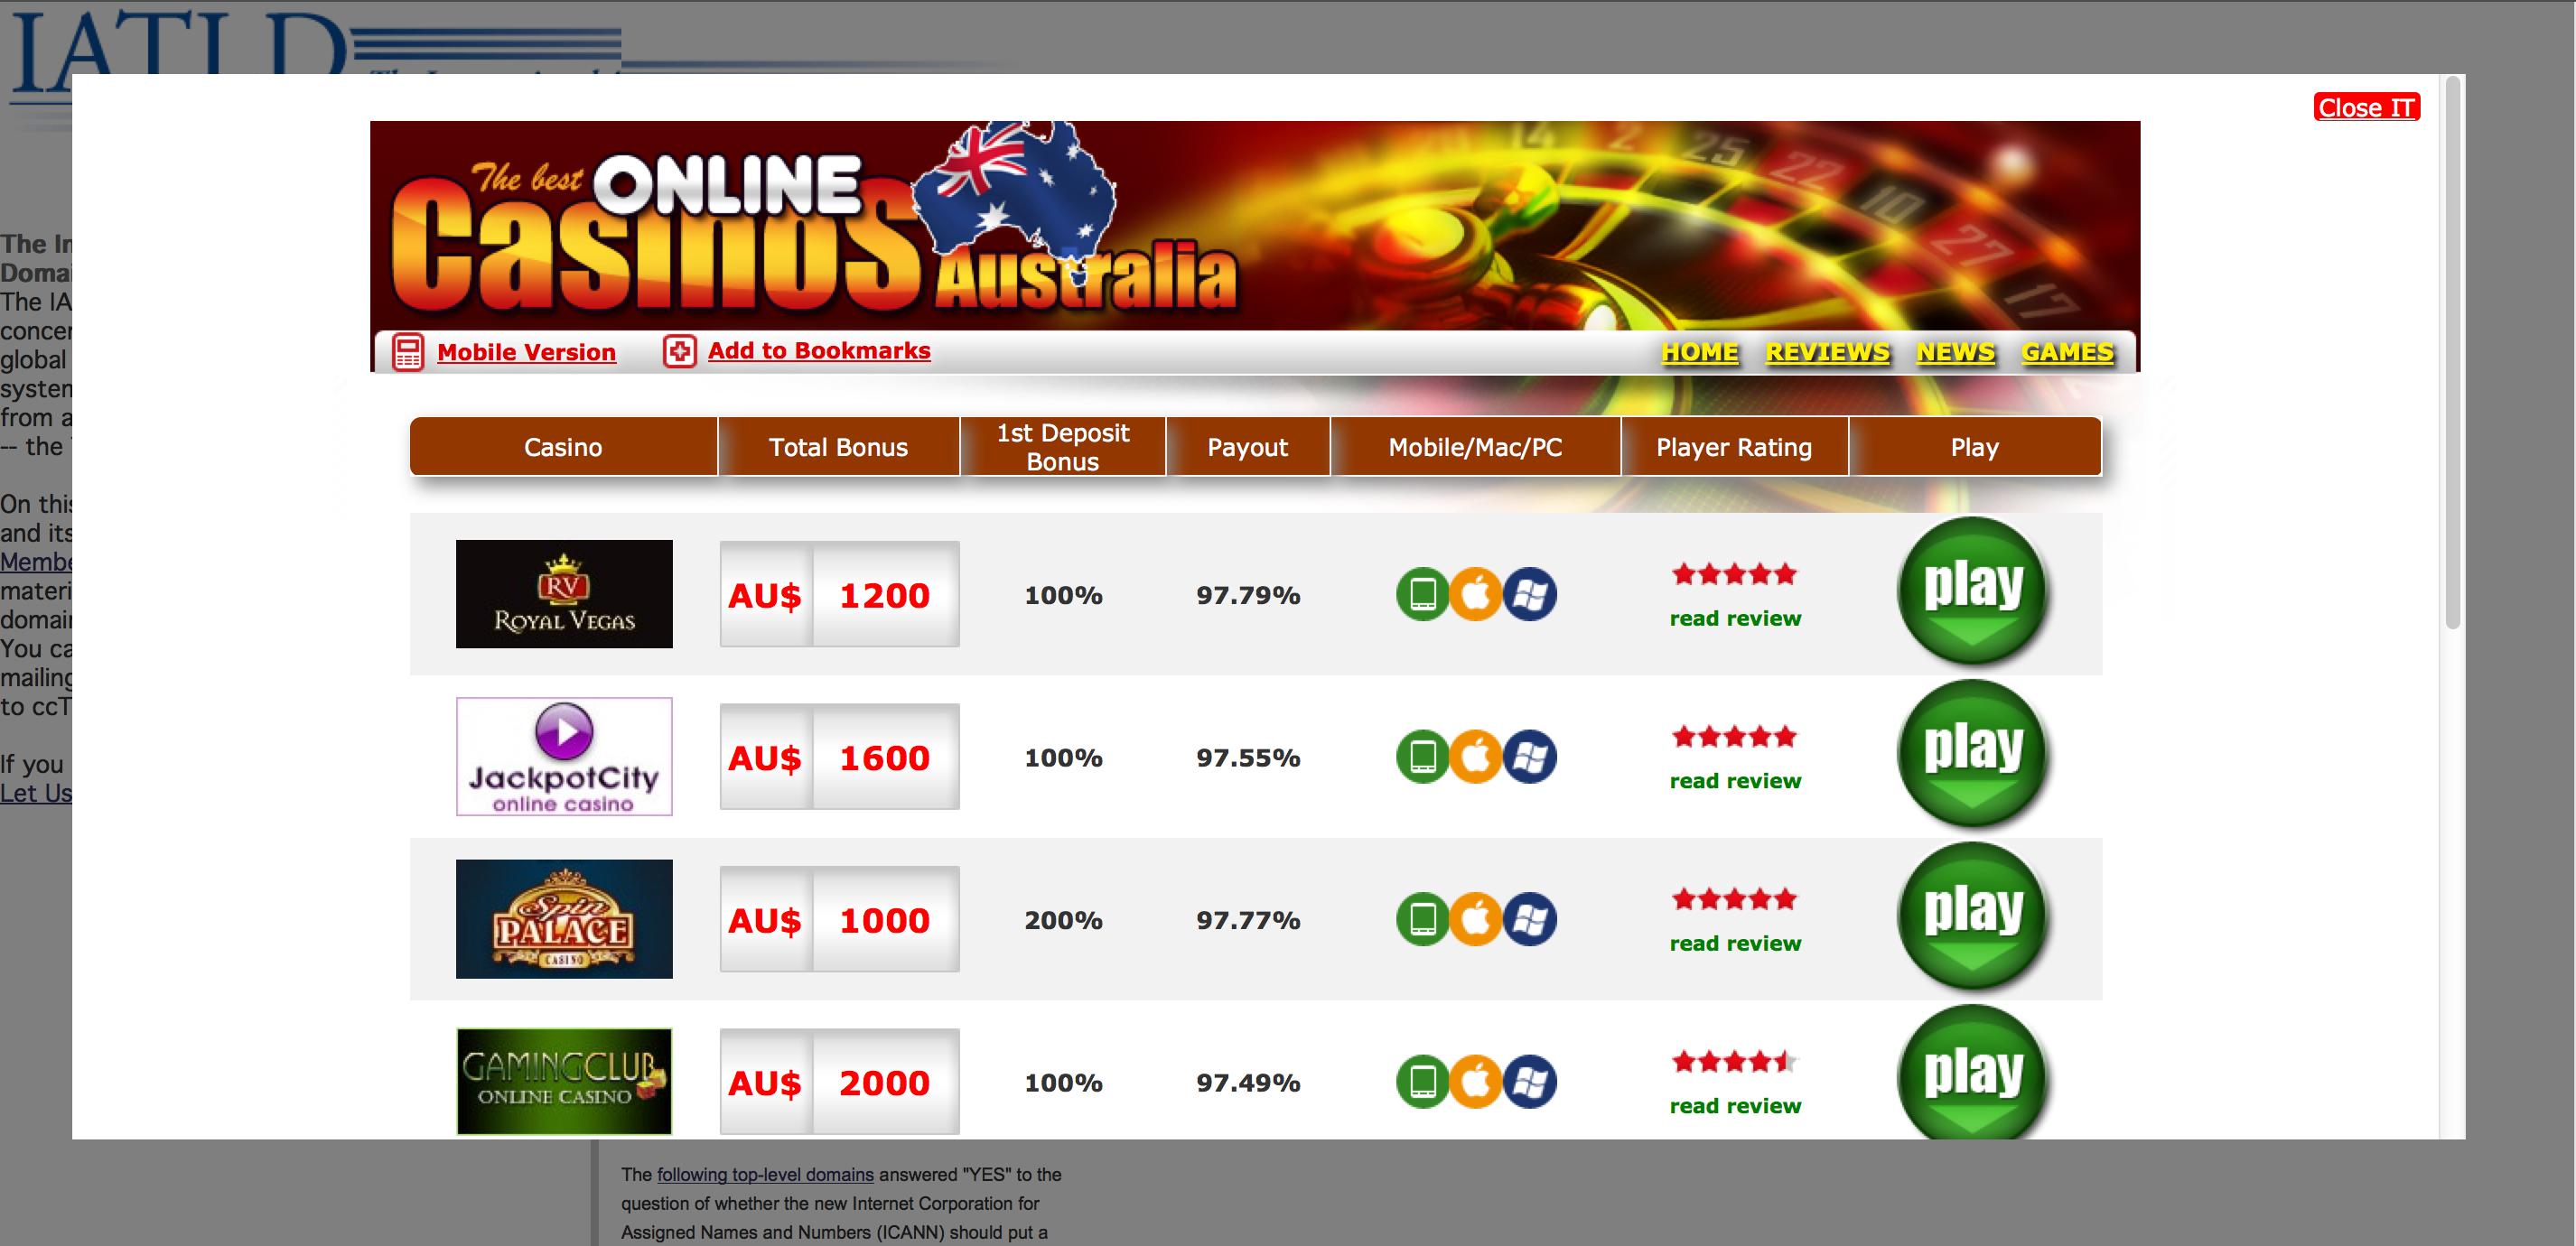 iatld-casino-popup